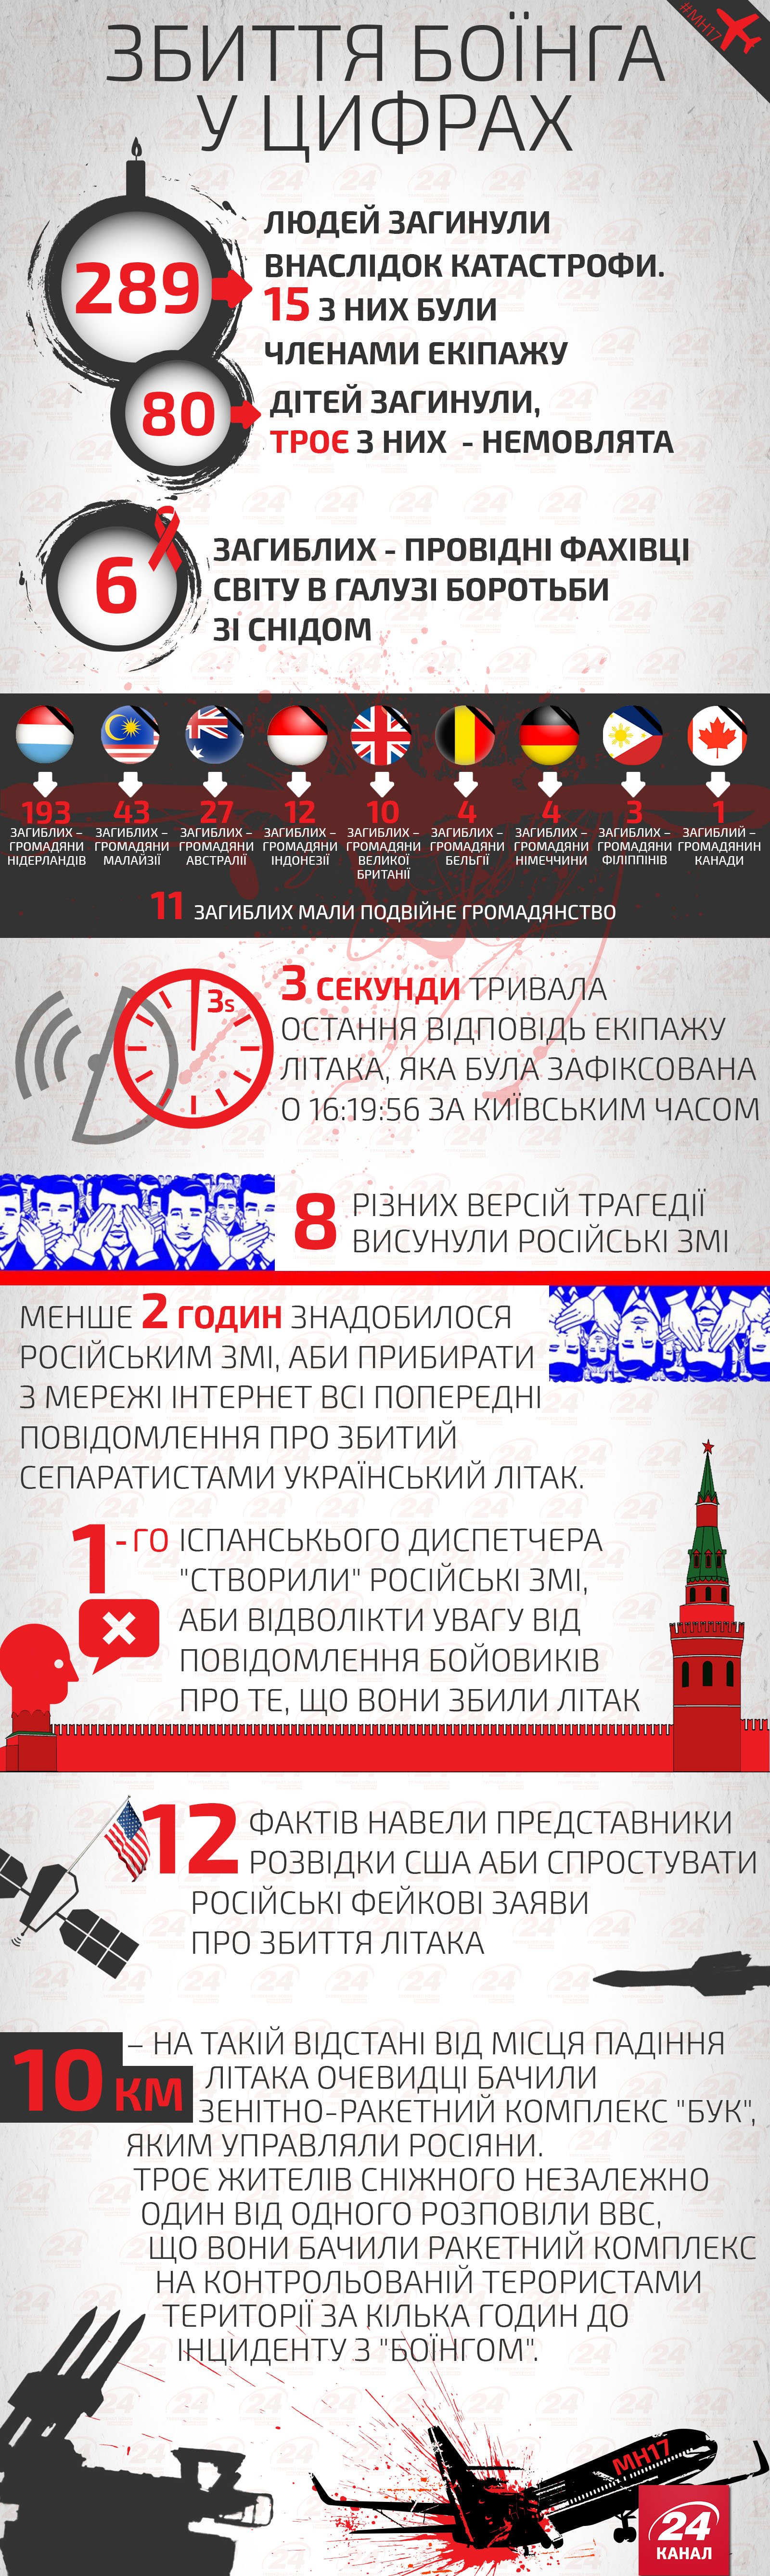 збиття боїнга над Донбасом у цифрах